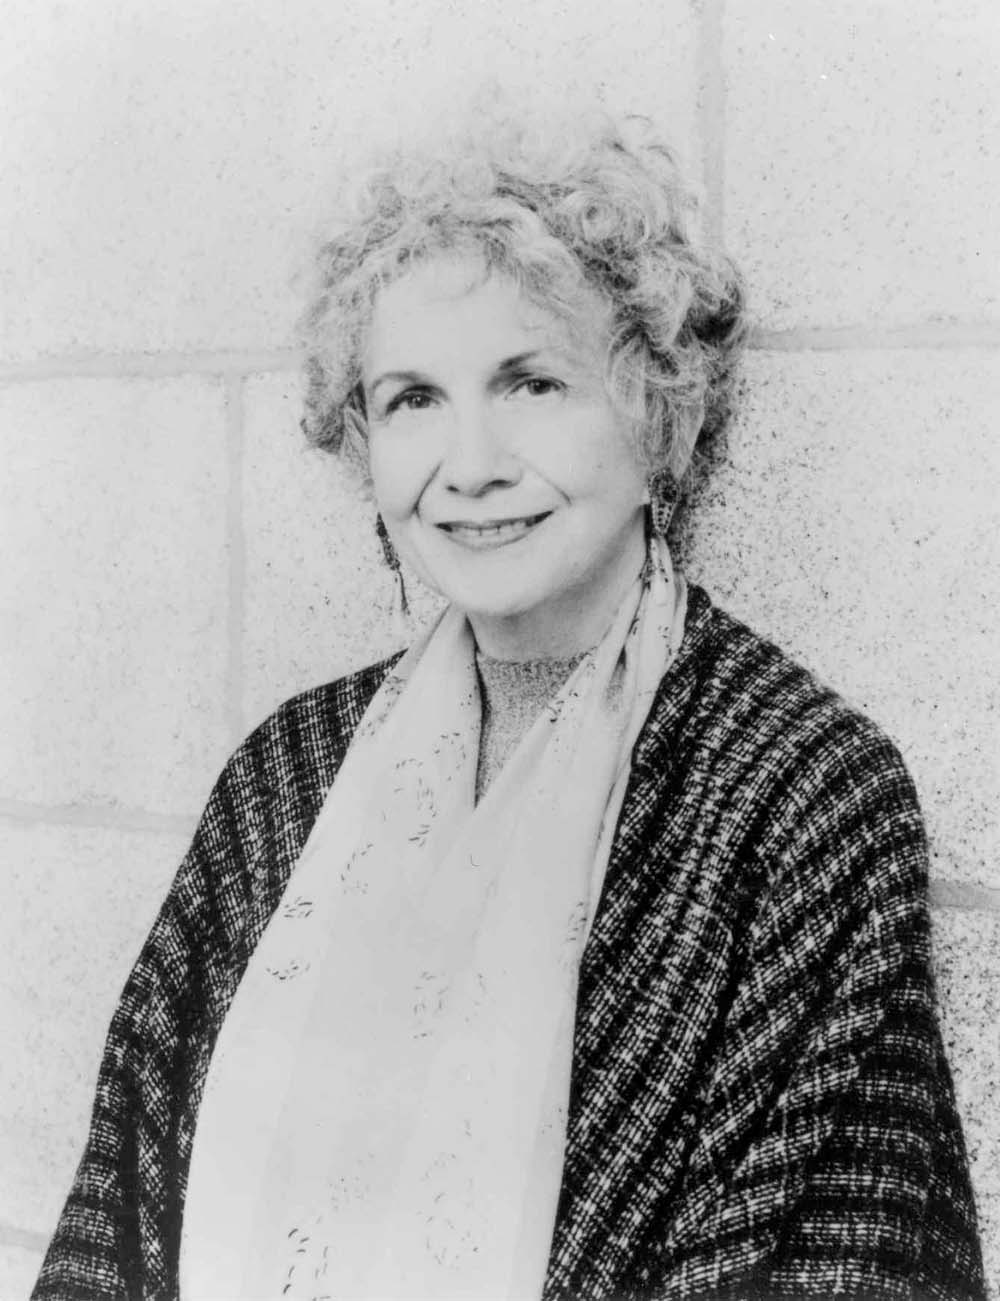 Alice Munro, from Random House Australia